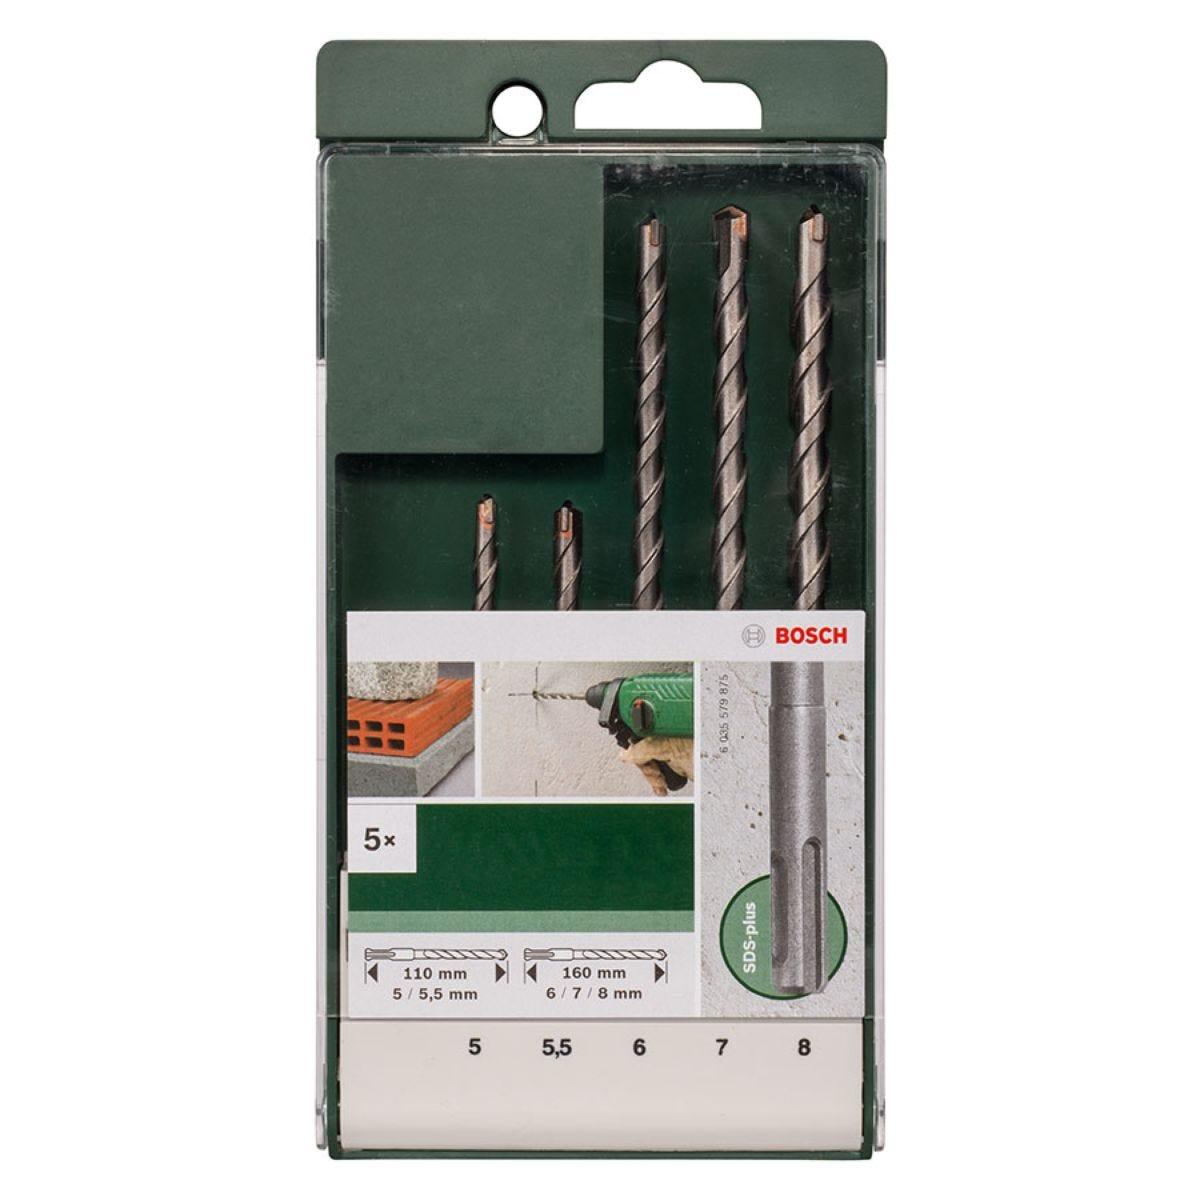 Bosch 5 Piece SDS-Plus Drill Bit Set